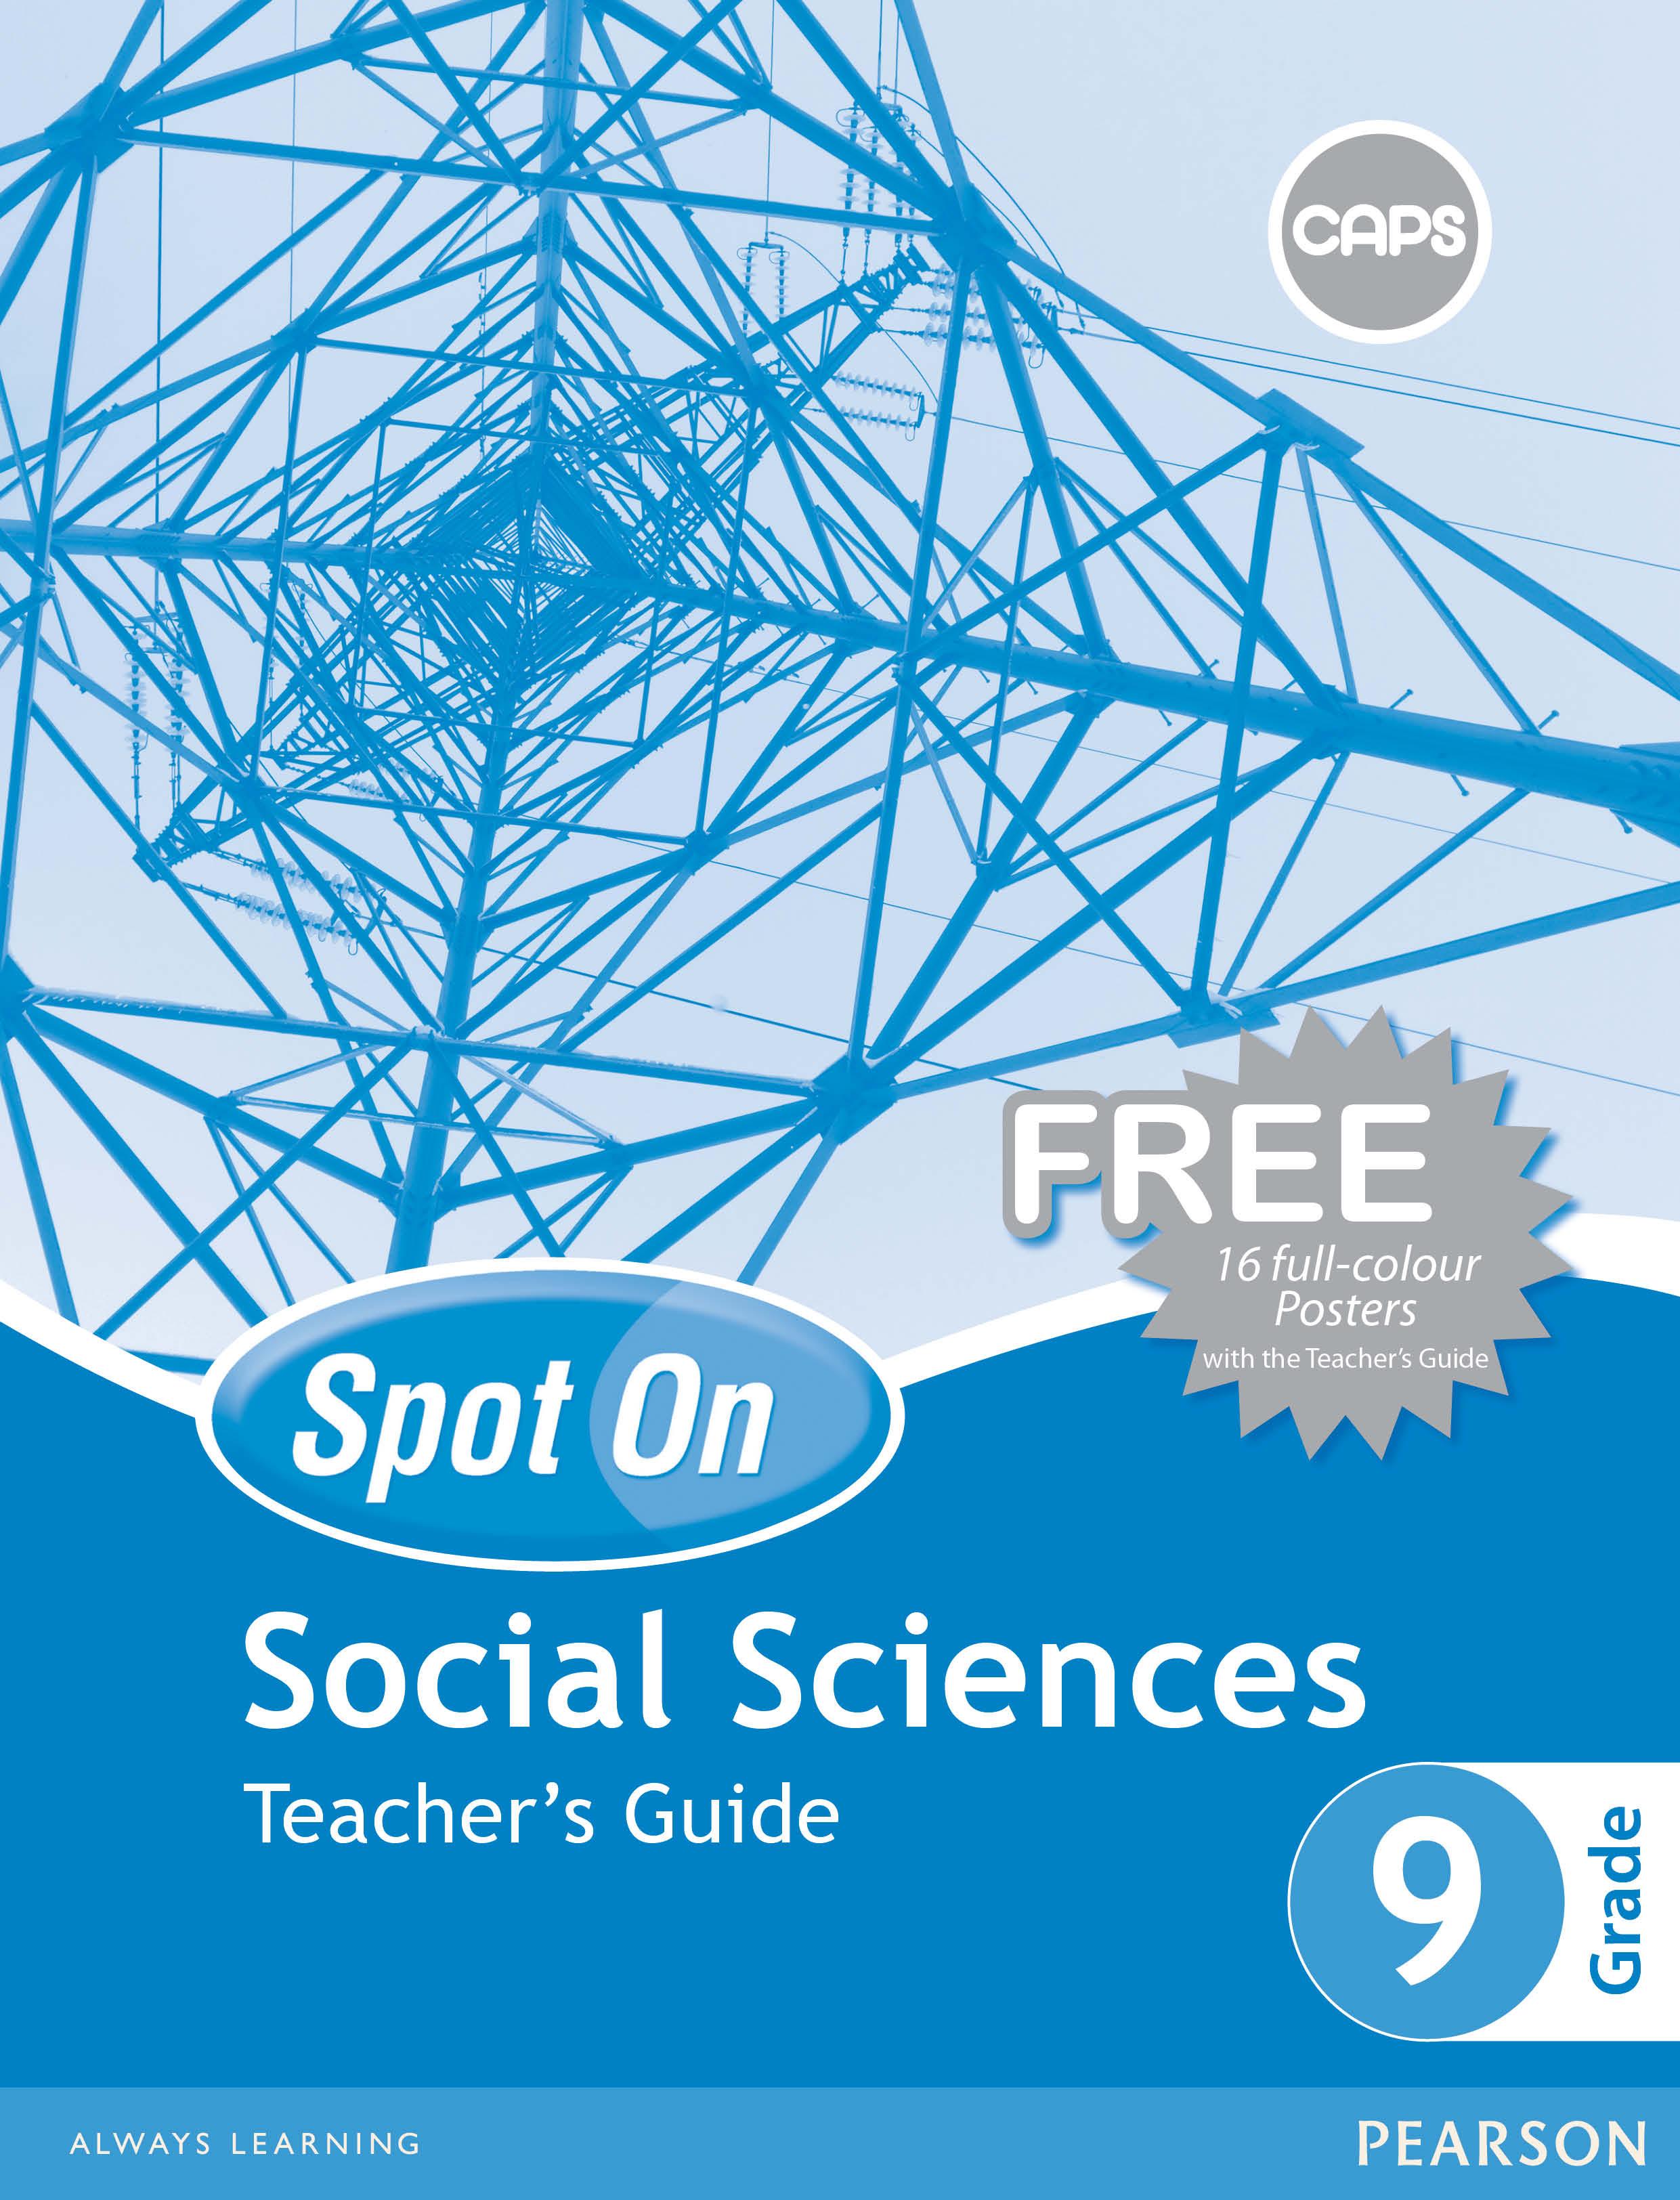 Spot On Social Sciences Grade 9 Teacher's Guide ePDF (1-year licence)